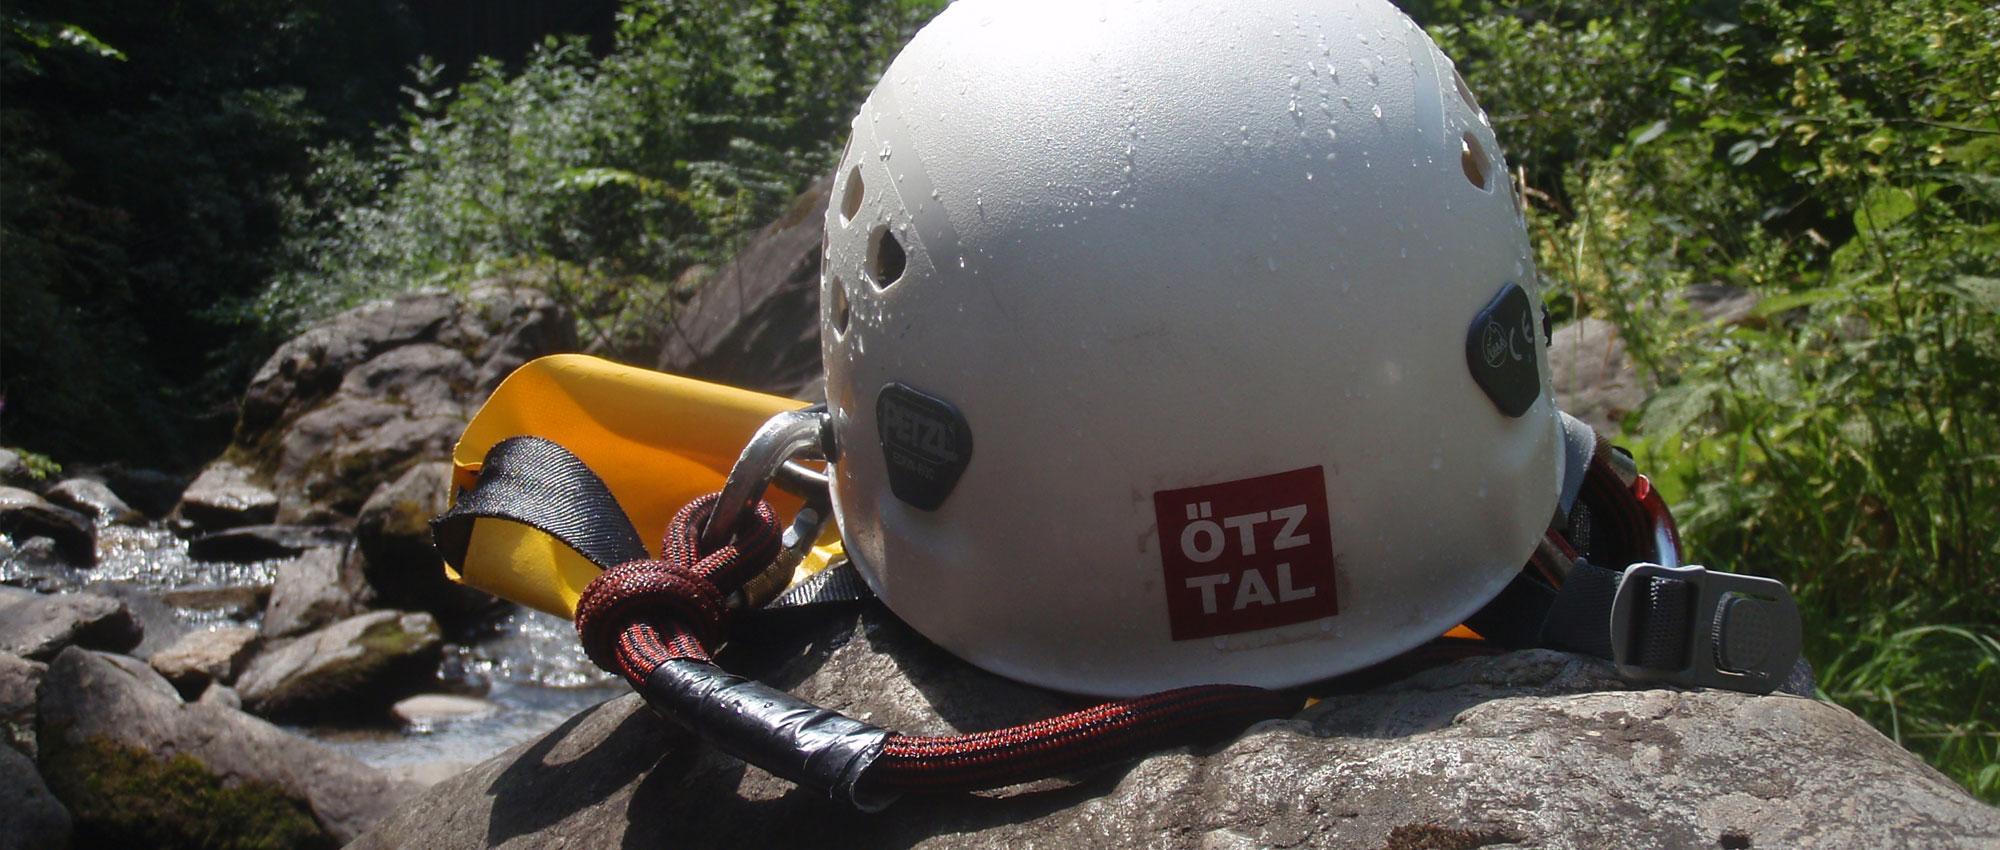 Canyoning Helm.jpg